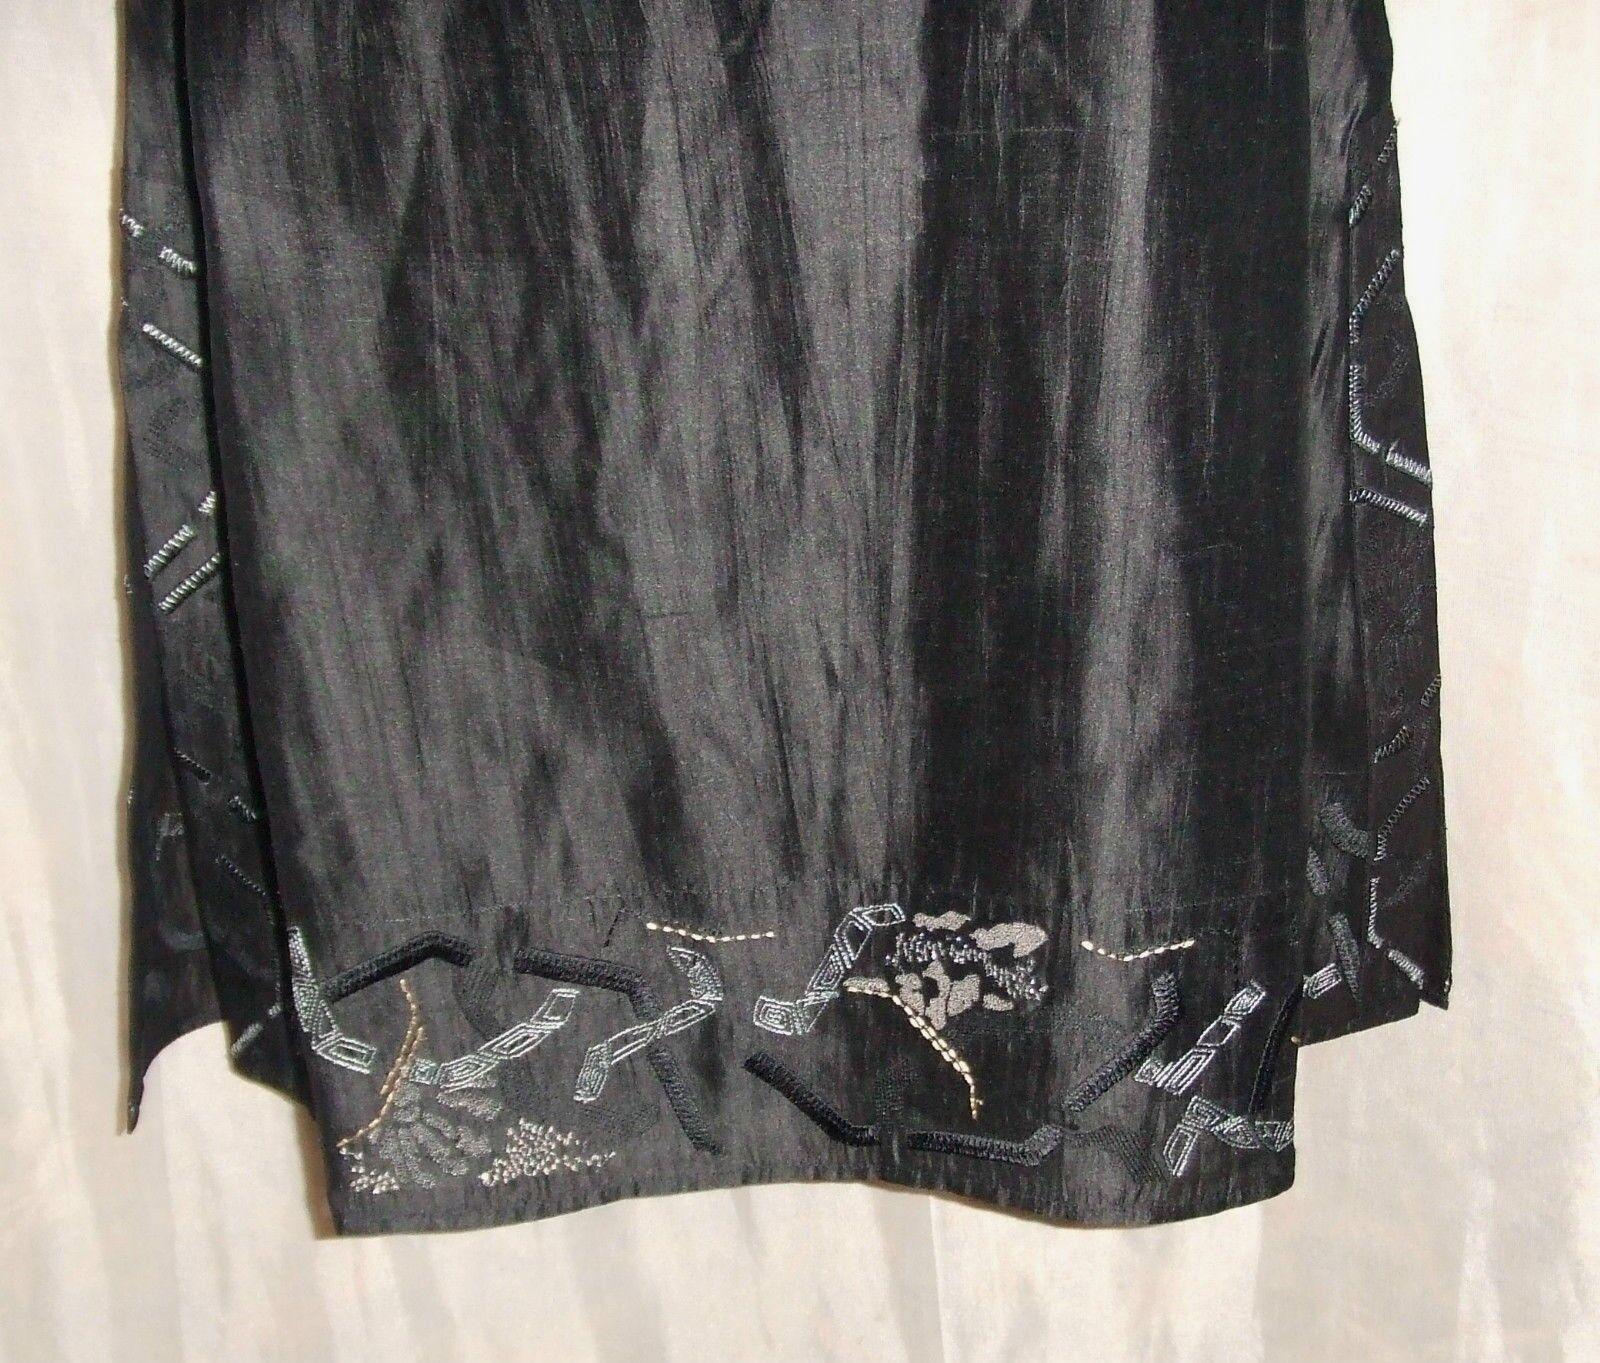 NITYA ROBE TUNIQUE blackE FLUIDE 100% SOIE MANCHES 3 3 3 4 PRIX 200 EUROS ae58e6